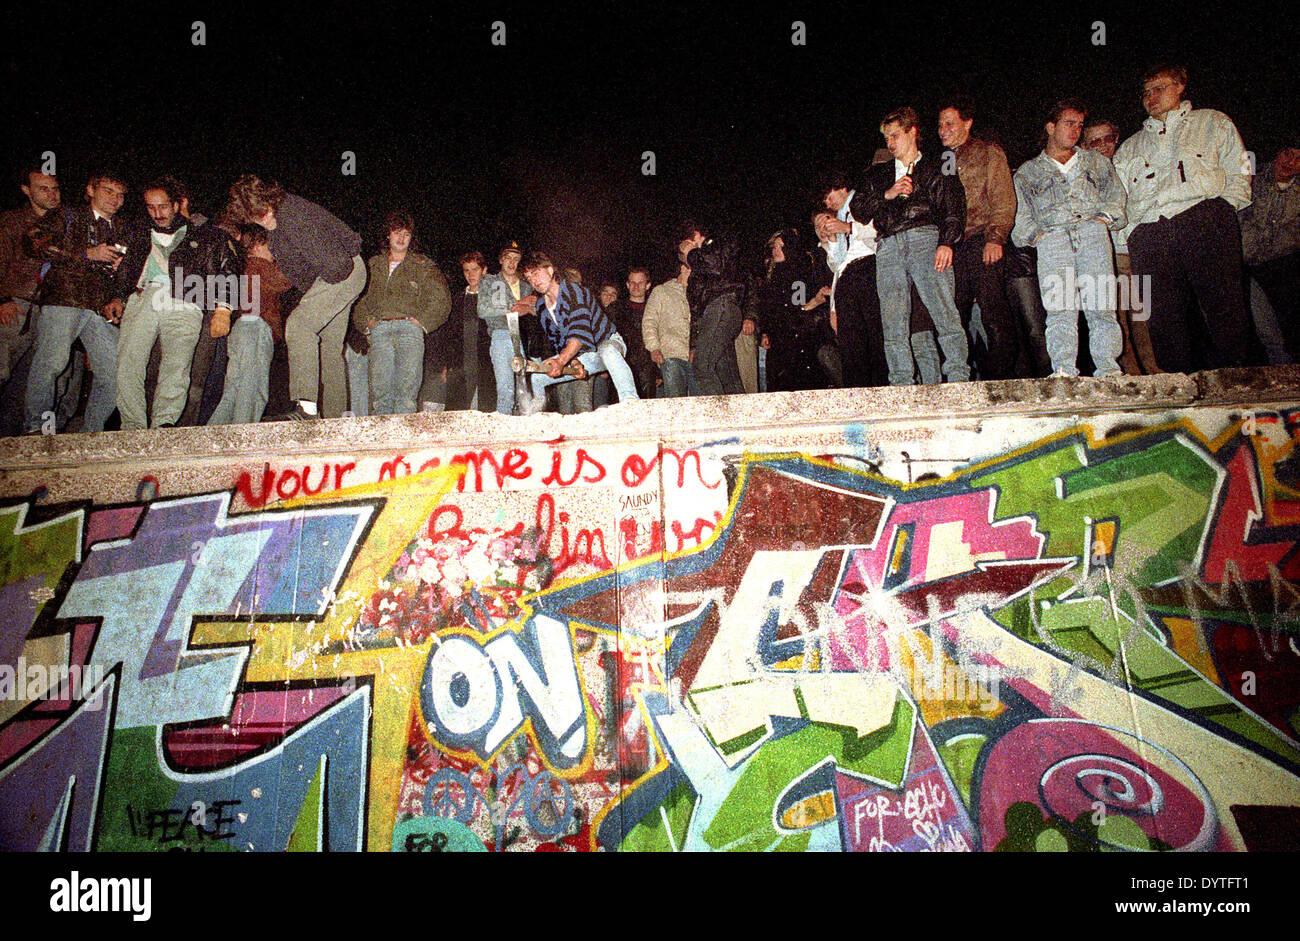 Fall of the Berlin Wall, 1989 Stock Photo